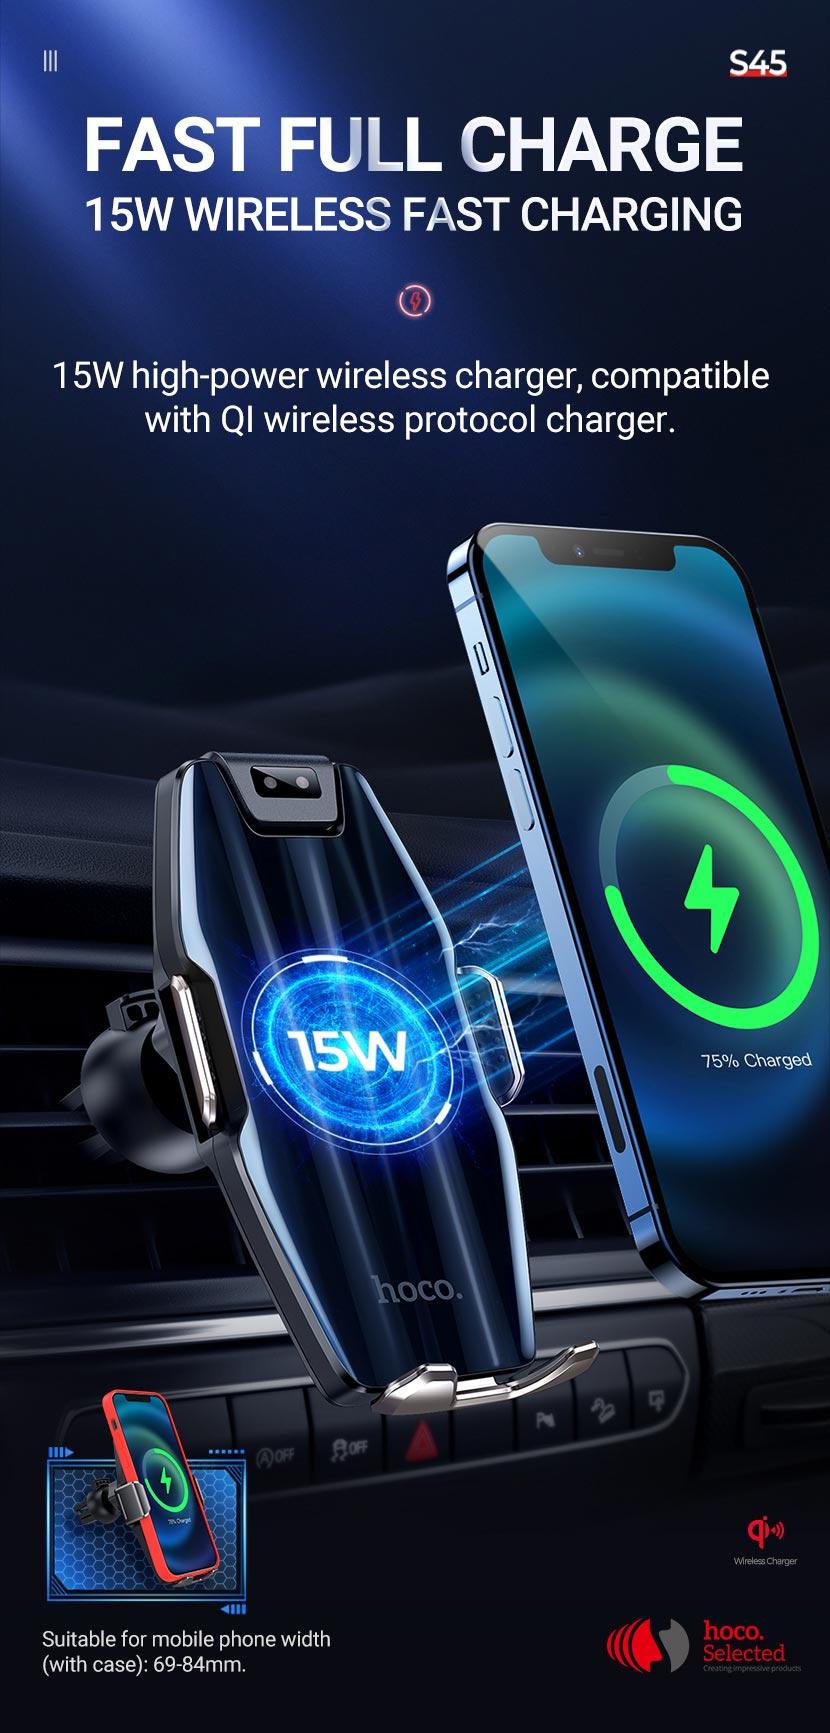 hoco selected s45 energia smart wireless charging car holder fast en